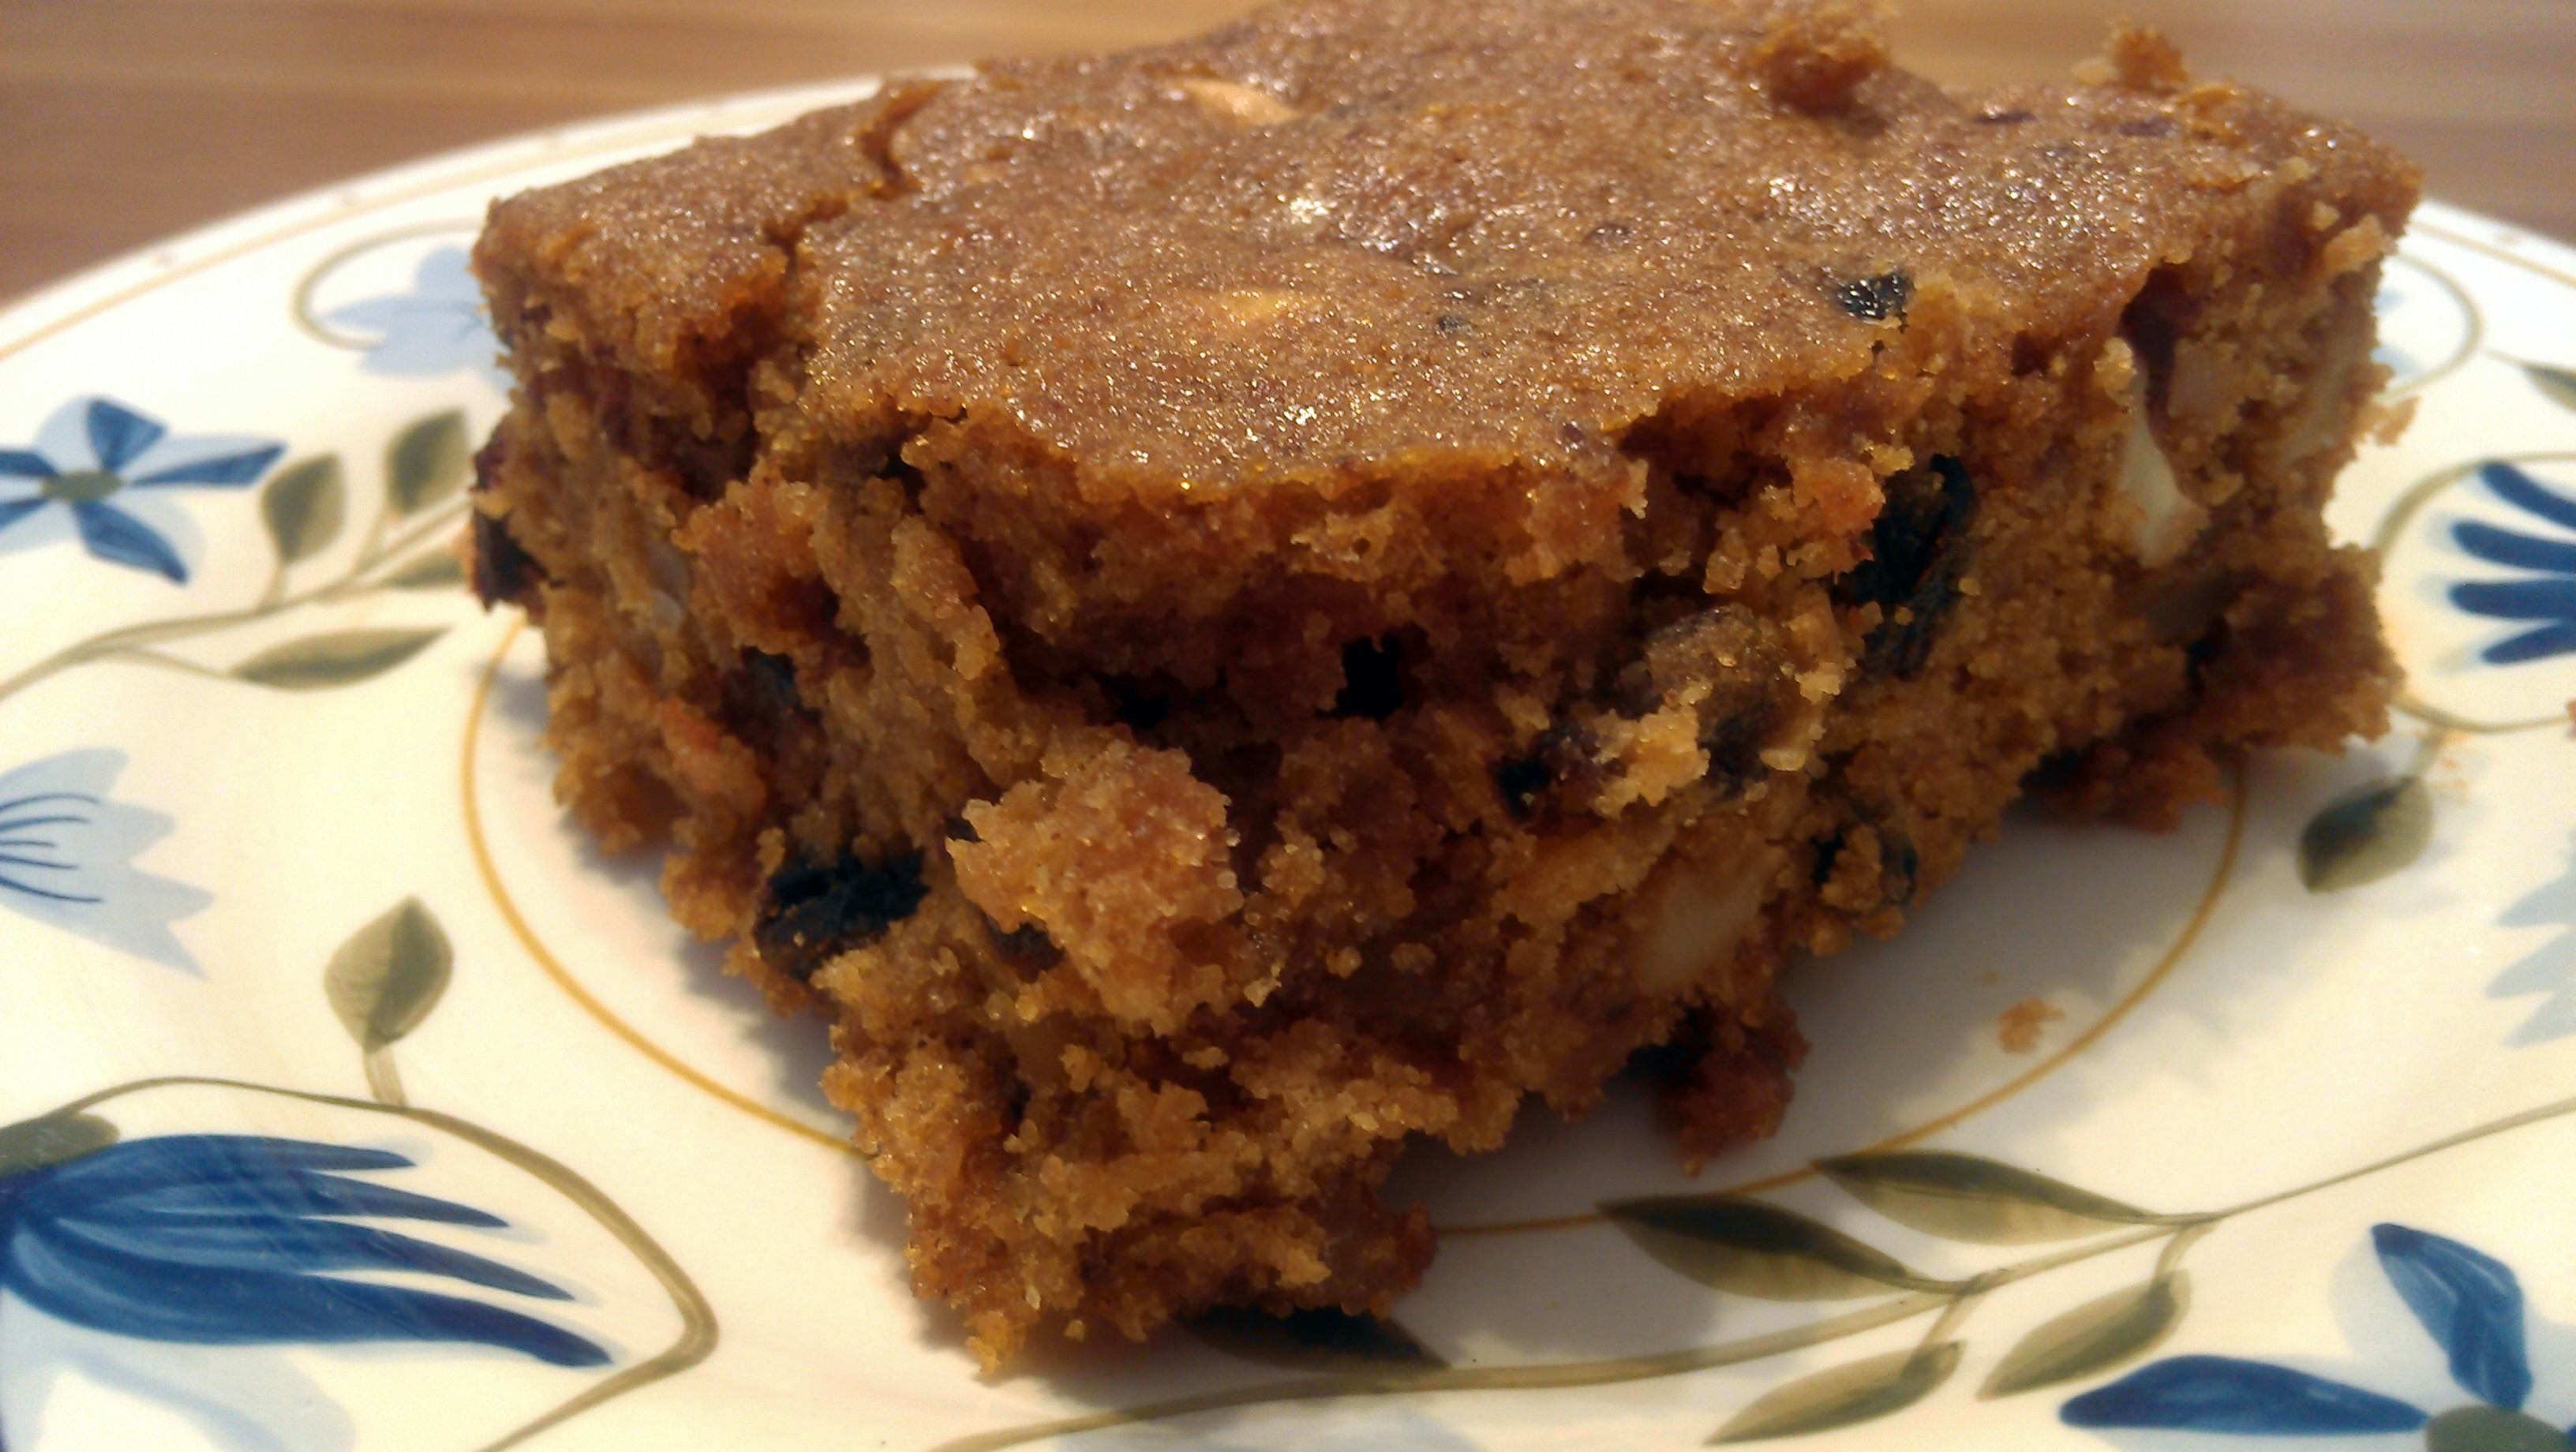 Sri Lanka Cake Recipes In Sinhala Language: The Hungary Buddha Eats The World